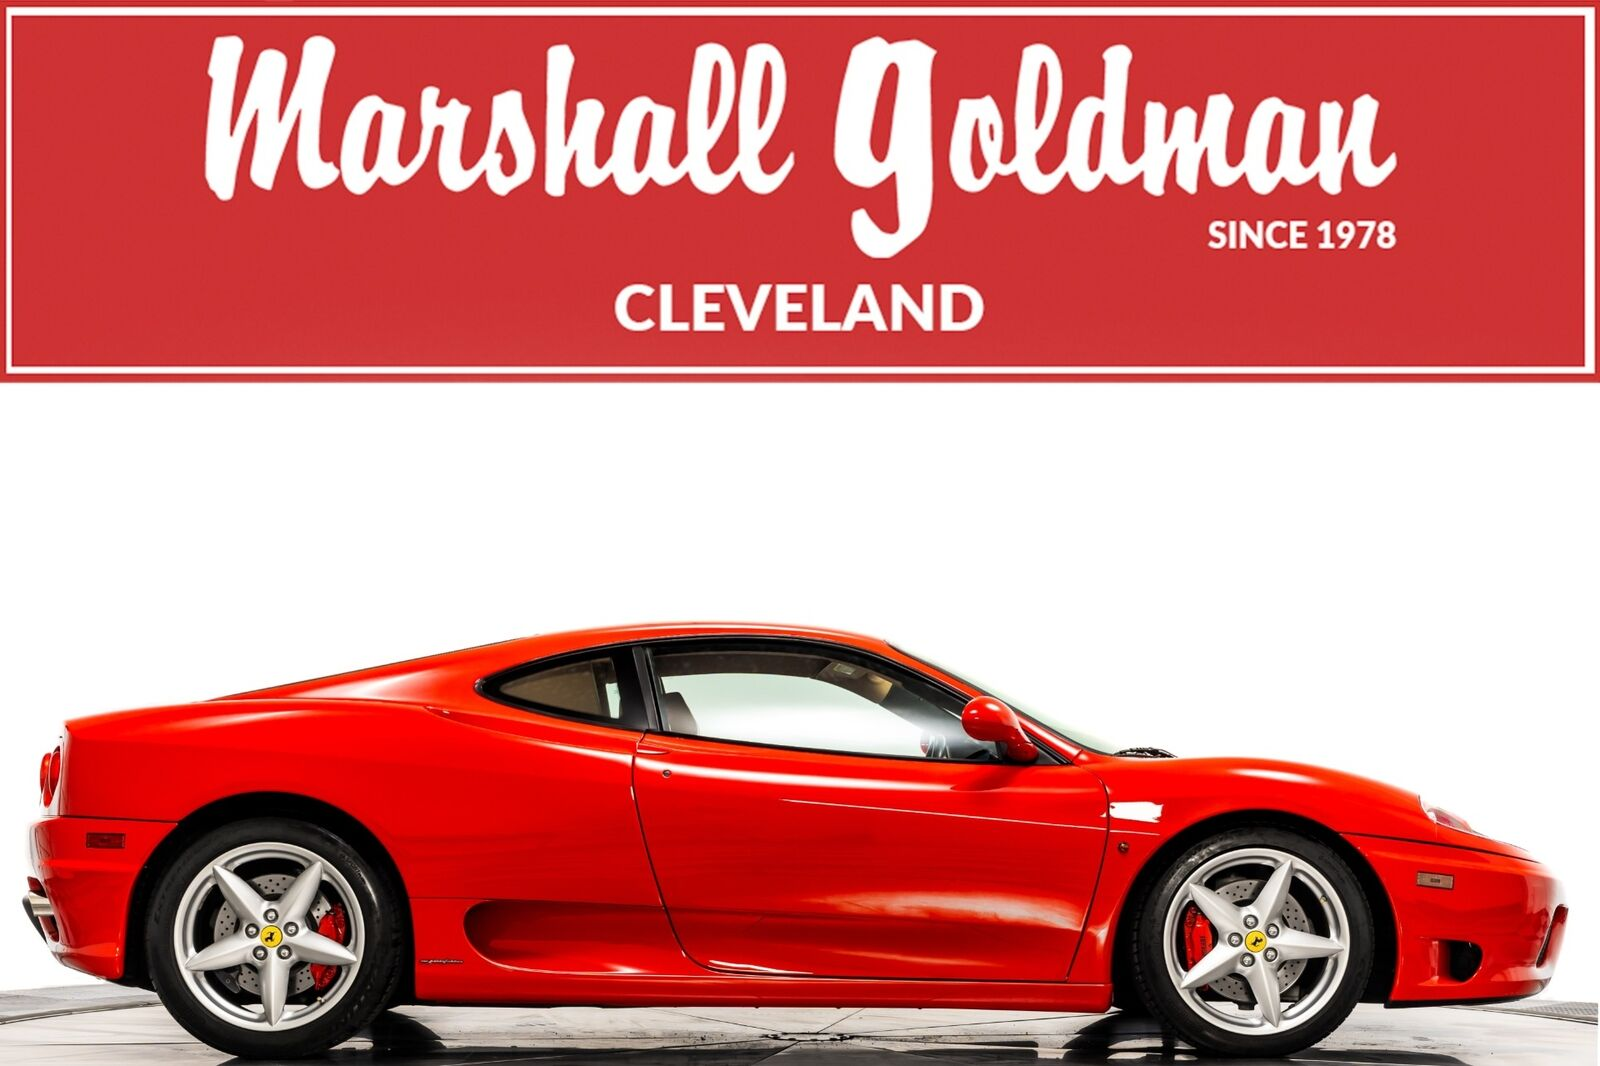 2003 Ferrari 360 Modena  Coupe 3.6L DOHC V8 400hp 276ft. lbs. 6-Speed F1